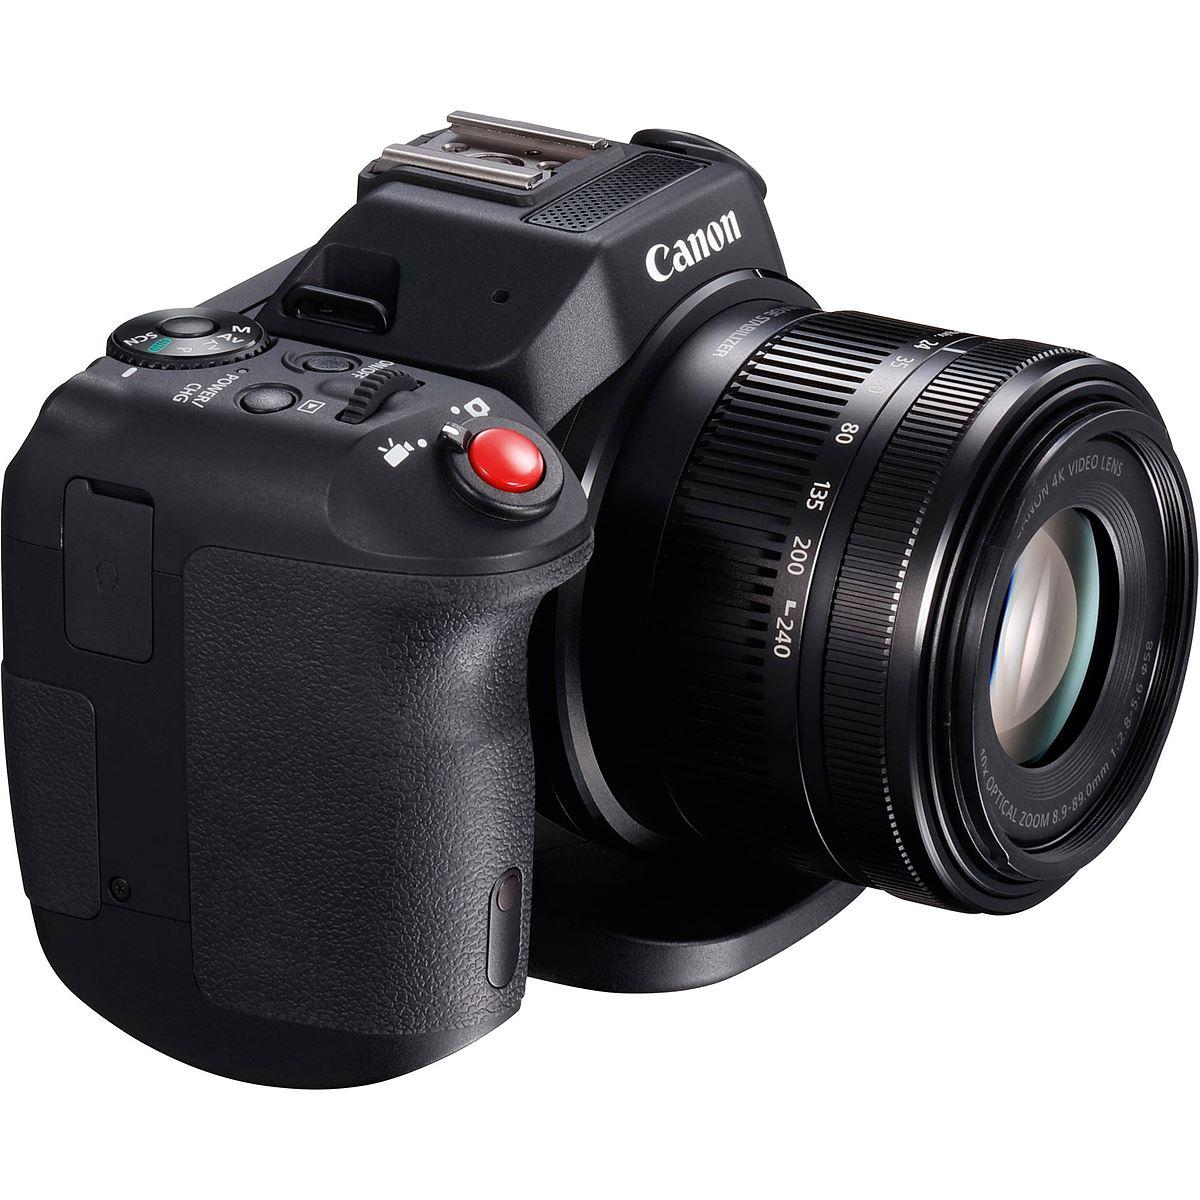 canon_1456c002_xc15_4k_professional_camcorder_1278108